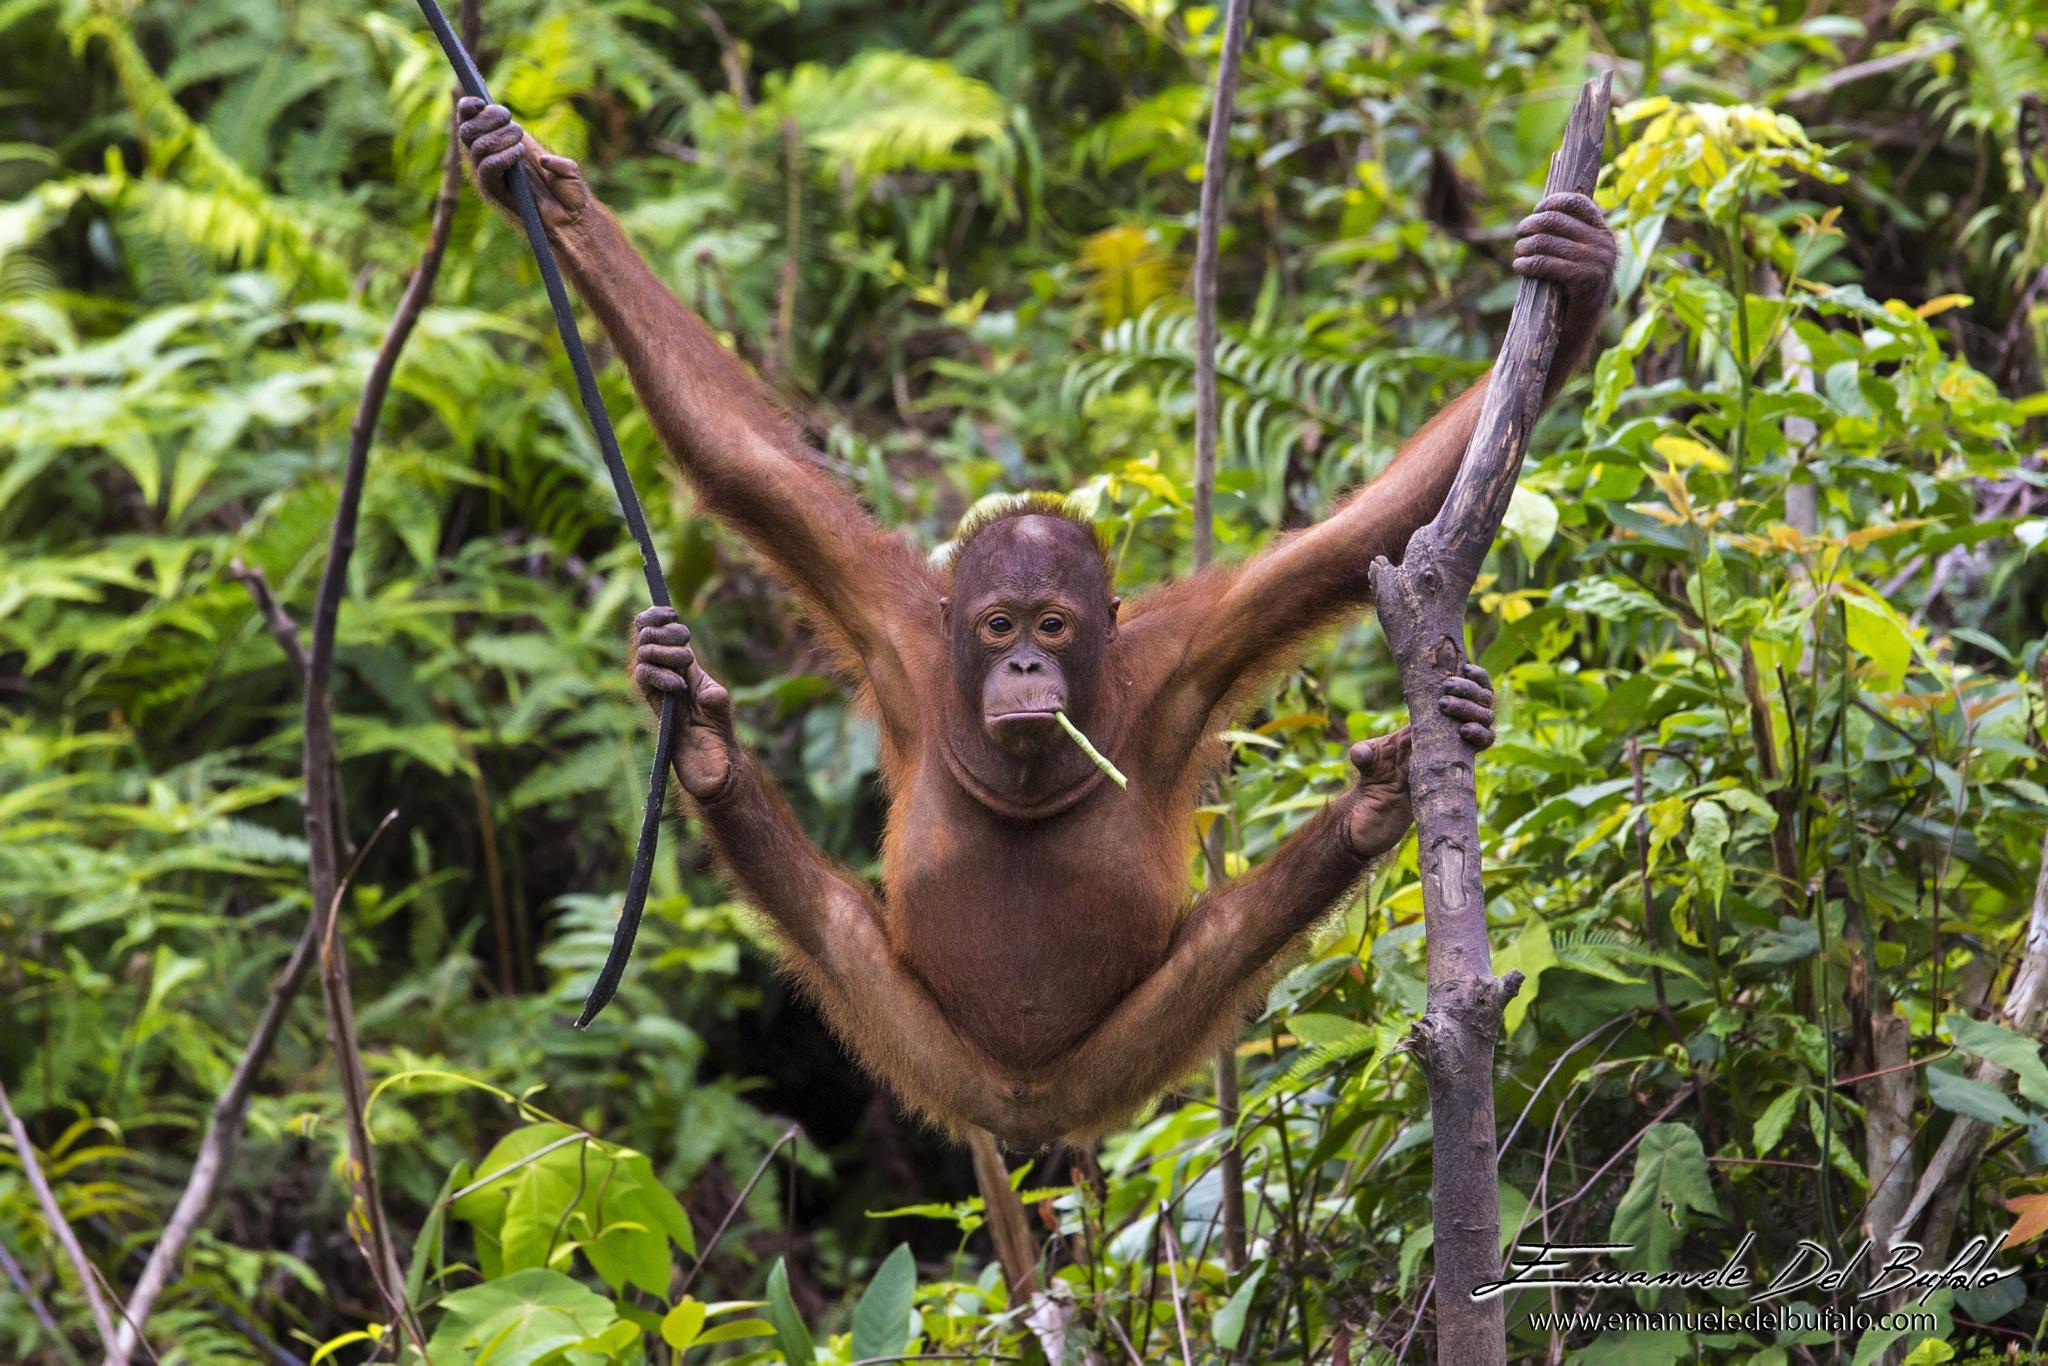 The sad Orangutan by The Long Term Traveler